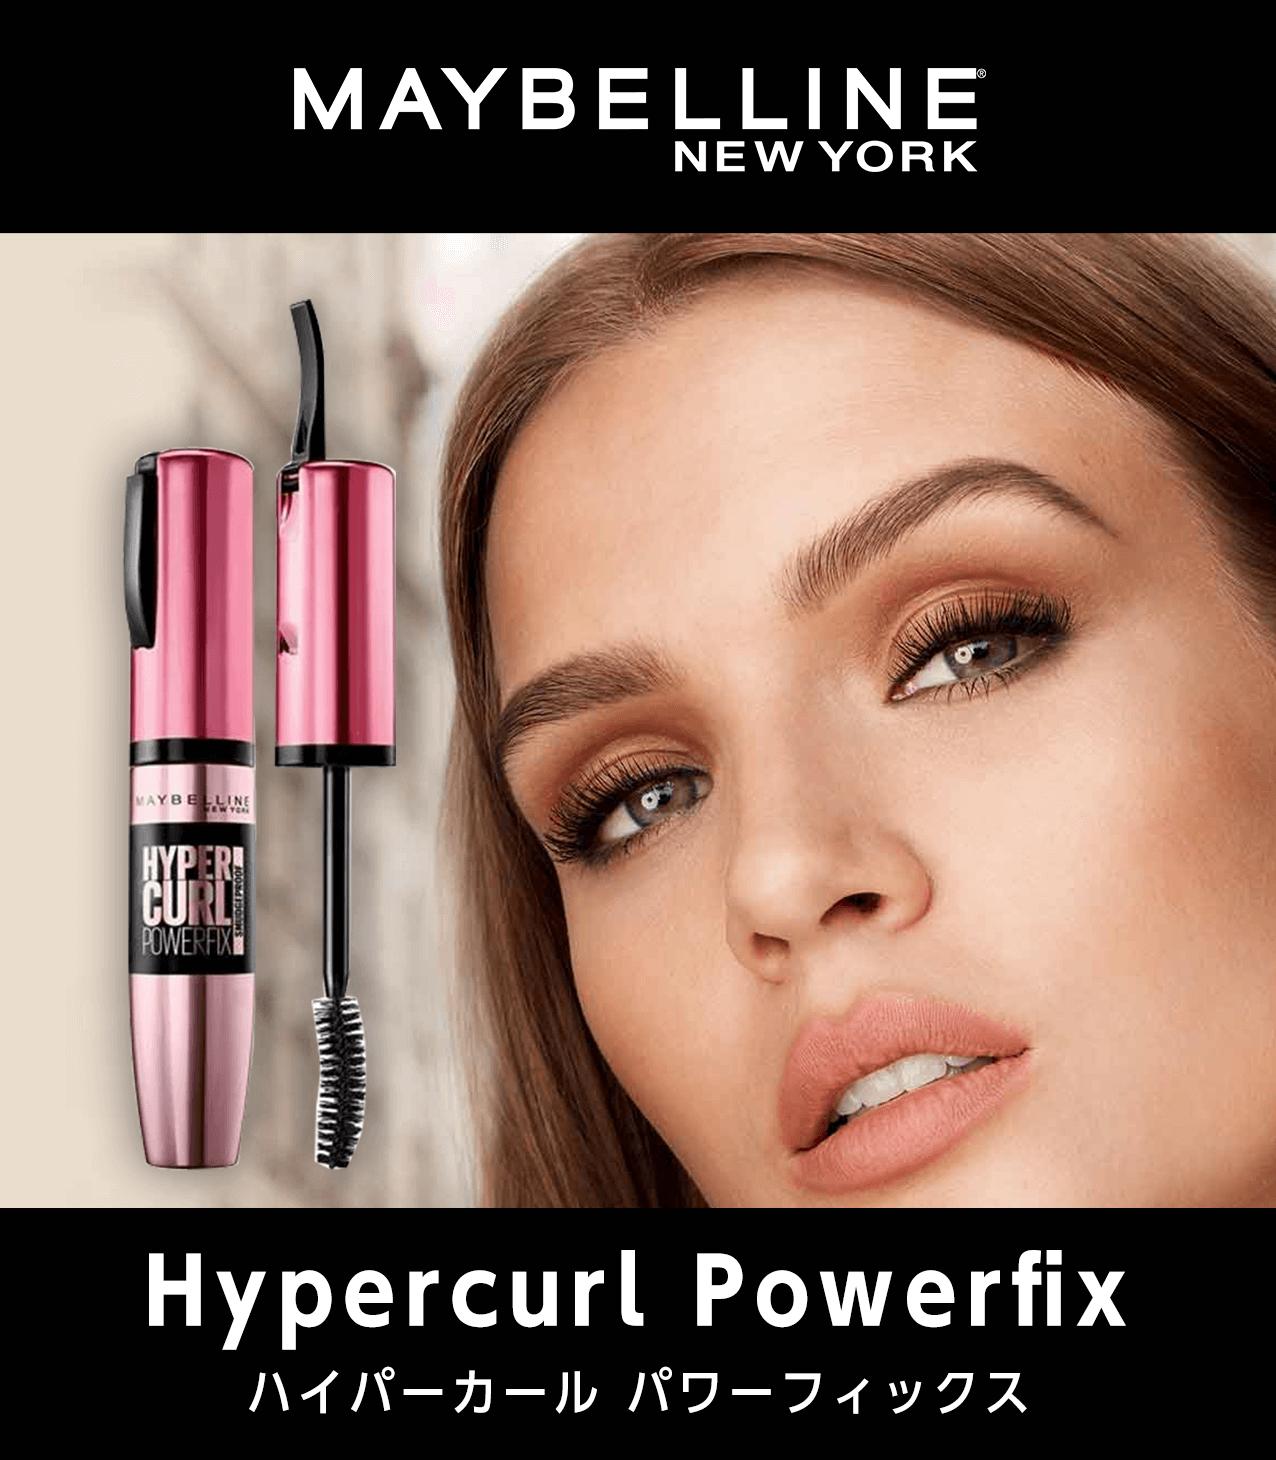 MAYBELLINE NEW YORK Hypercurl Powerfix ハイパーカールパワーフィックス